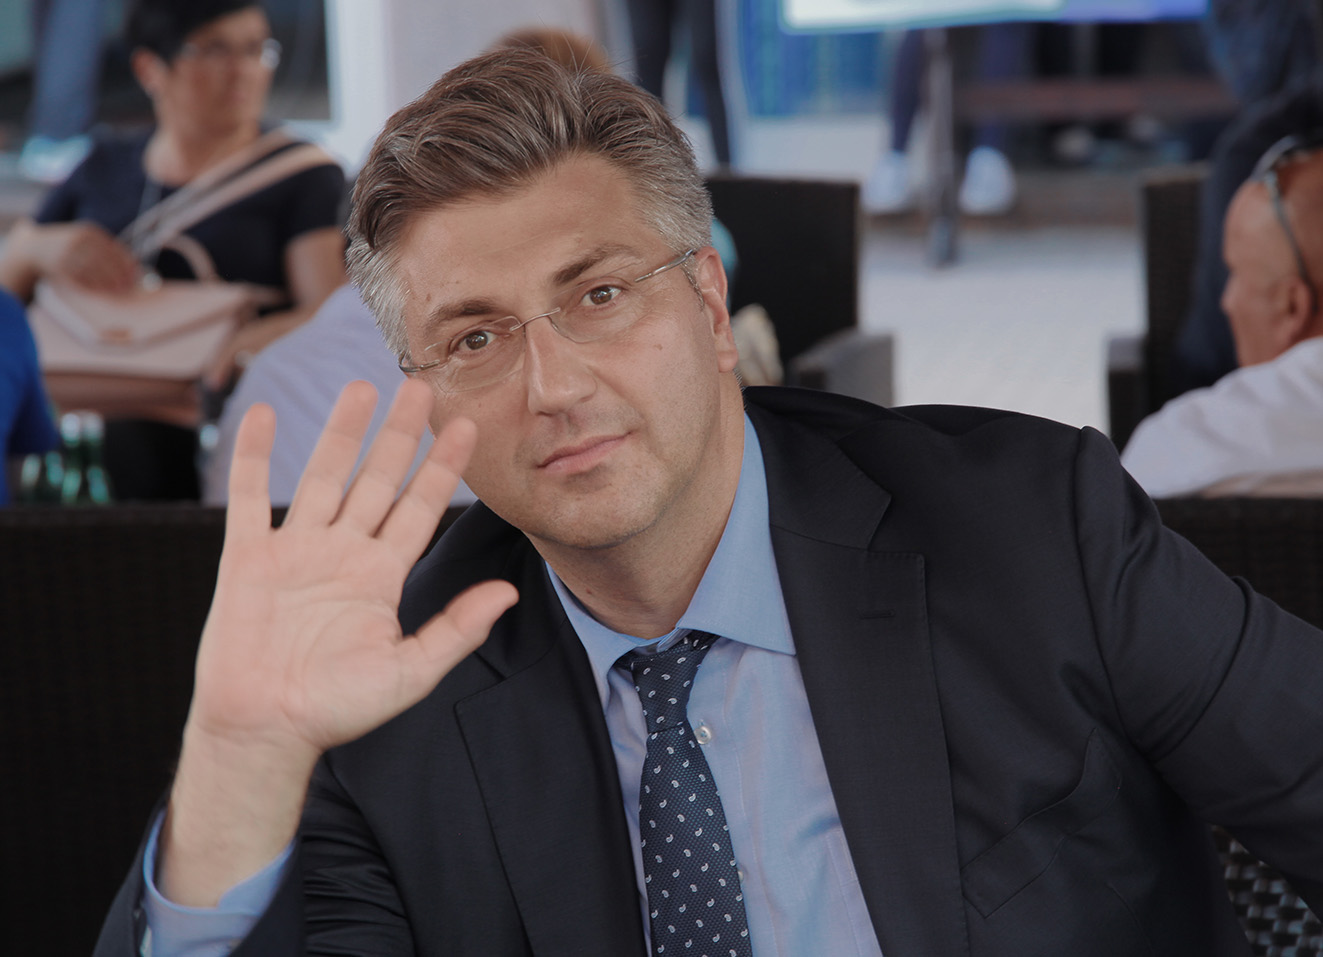 Posjet Andreja Plenkovića, predsjednika Vlade RH, Đakovu